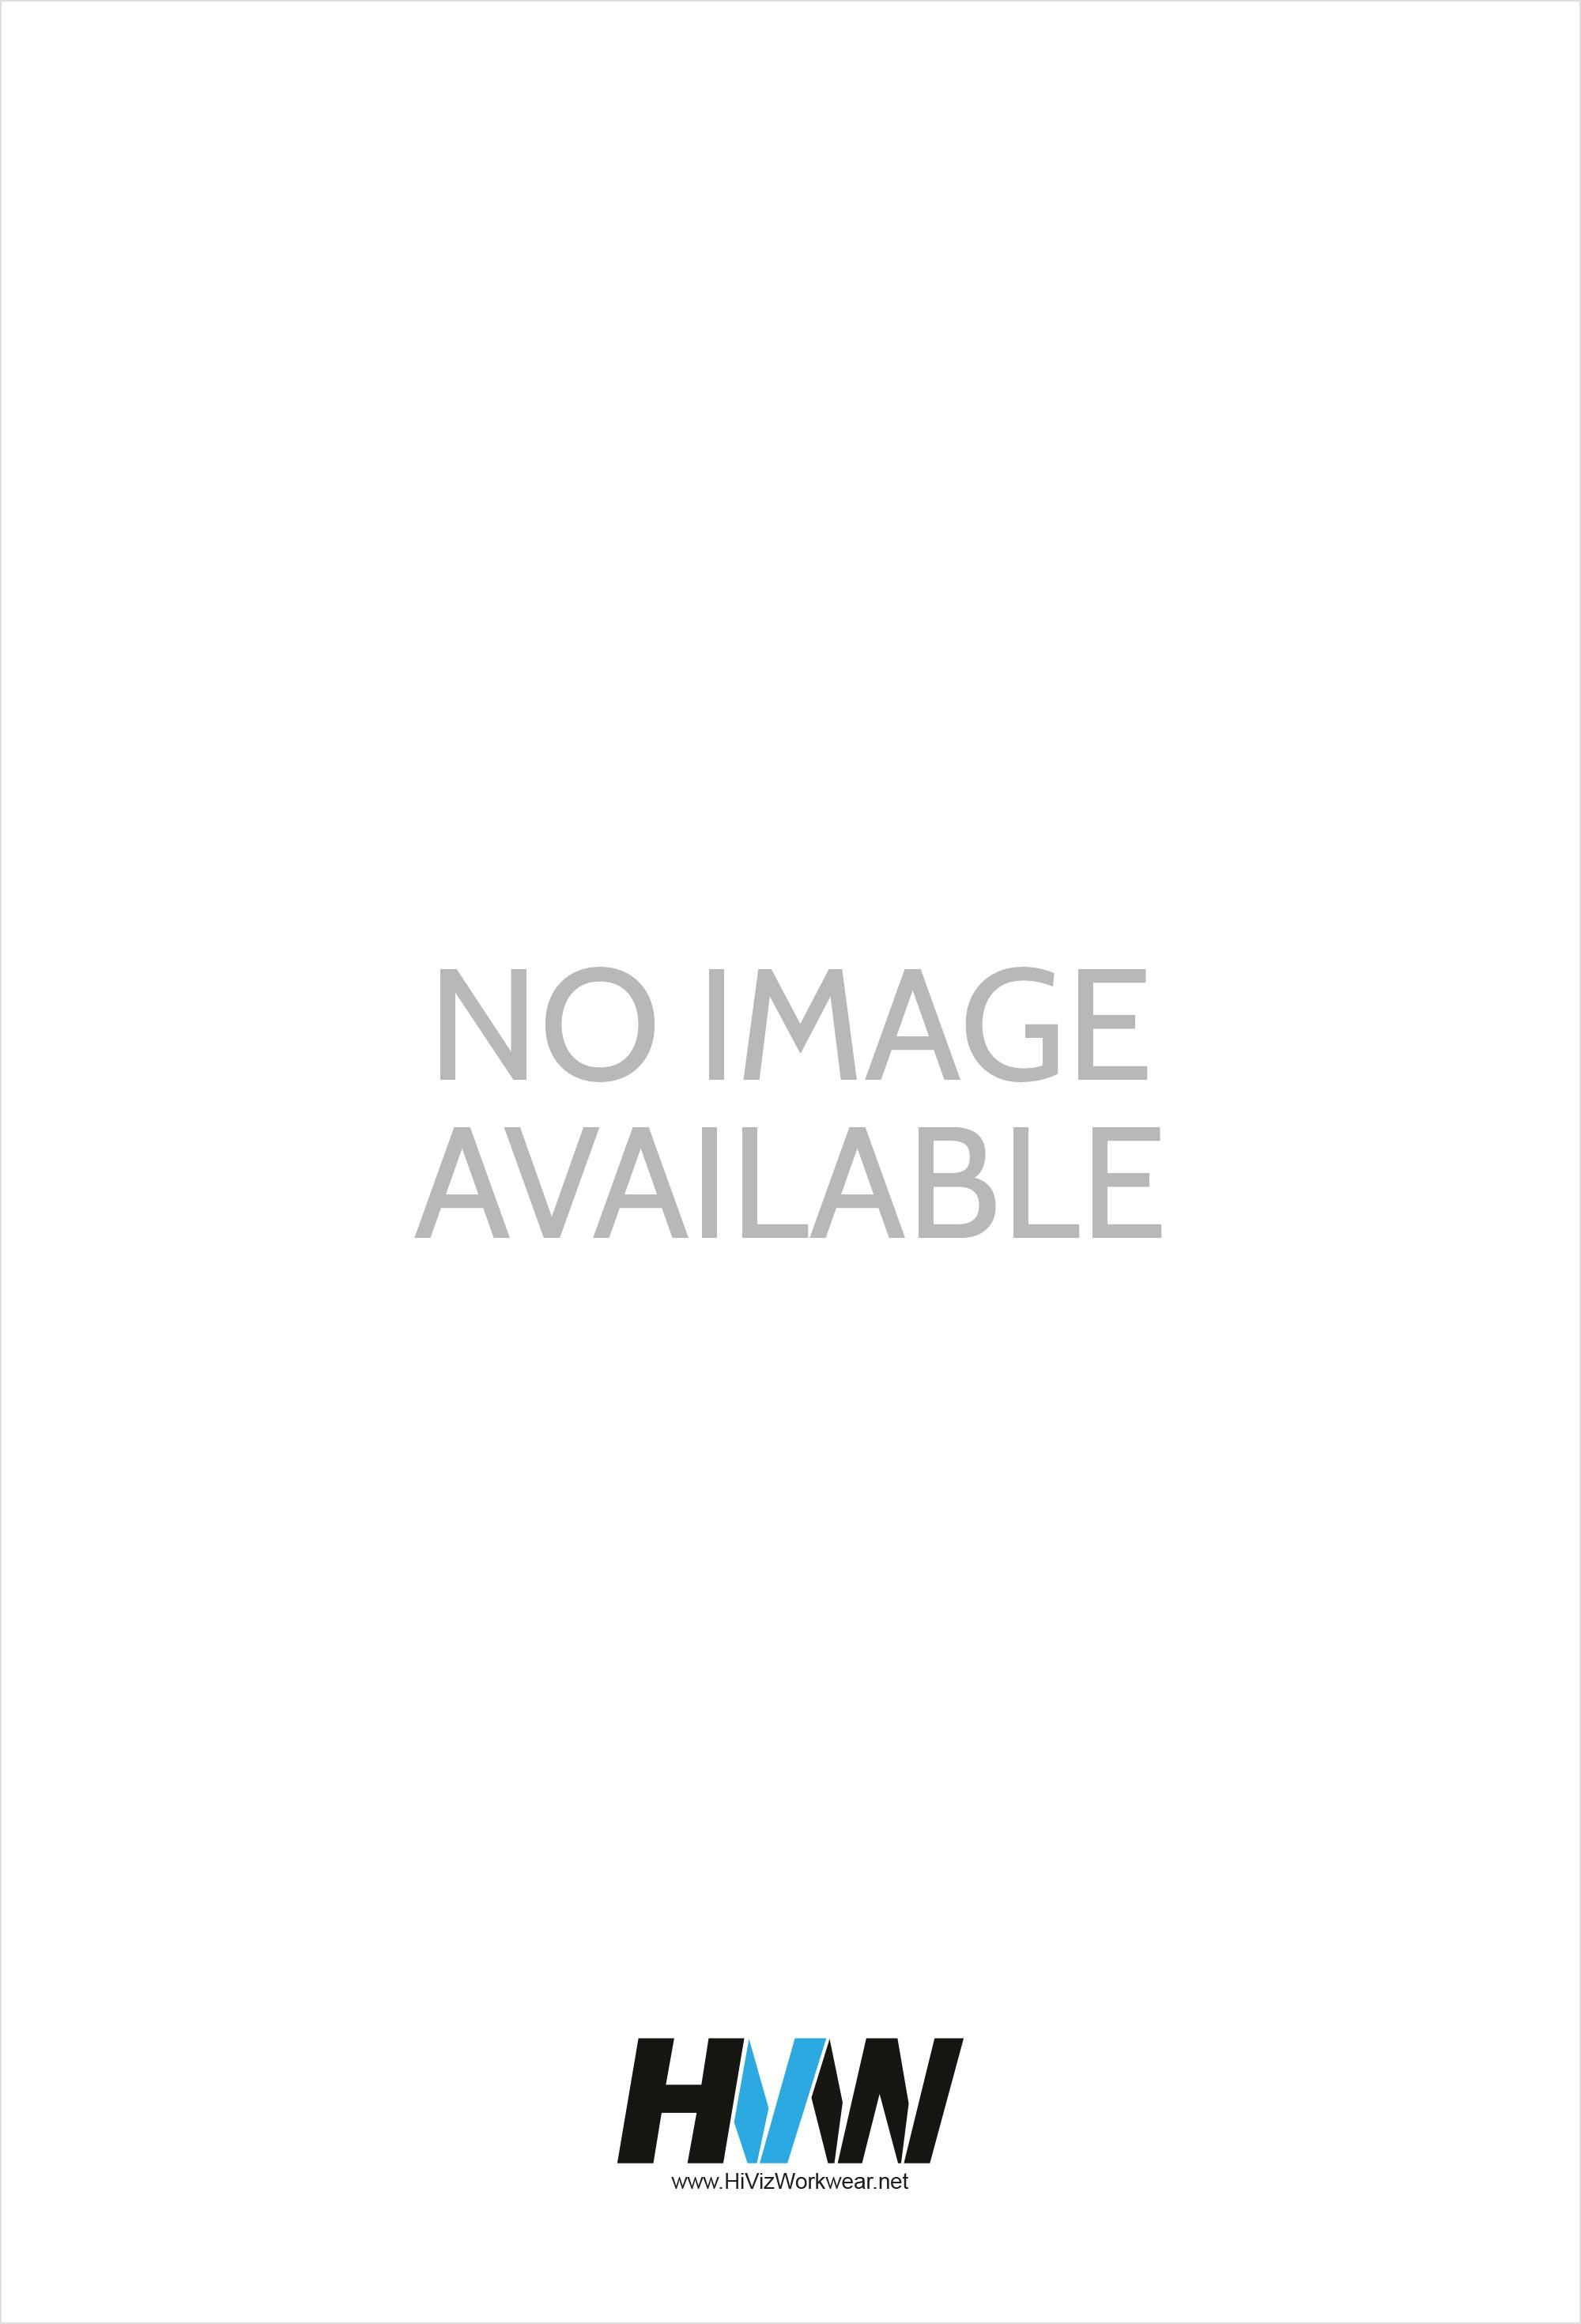 Kustom Kit KK351 WorkWear Oxford Long Sleeved Shirt  (Collar Size 14.5 To 18.5)